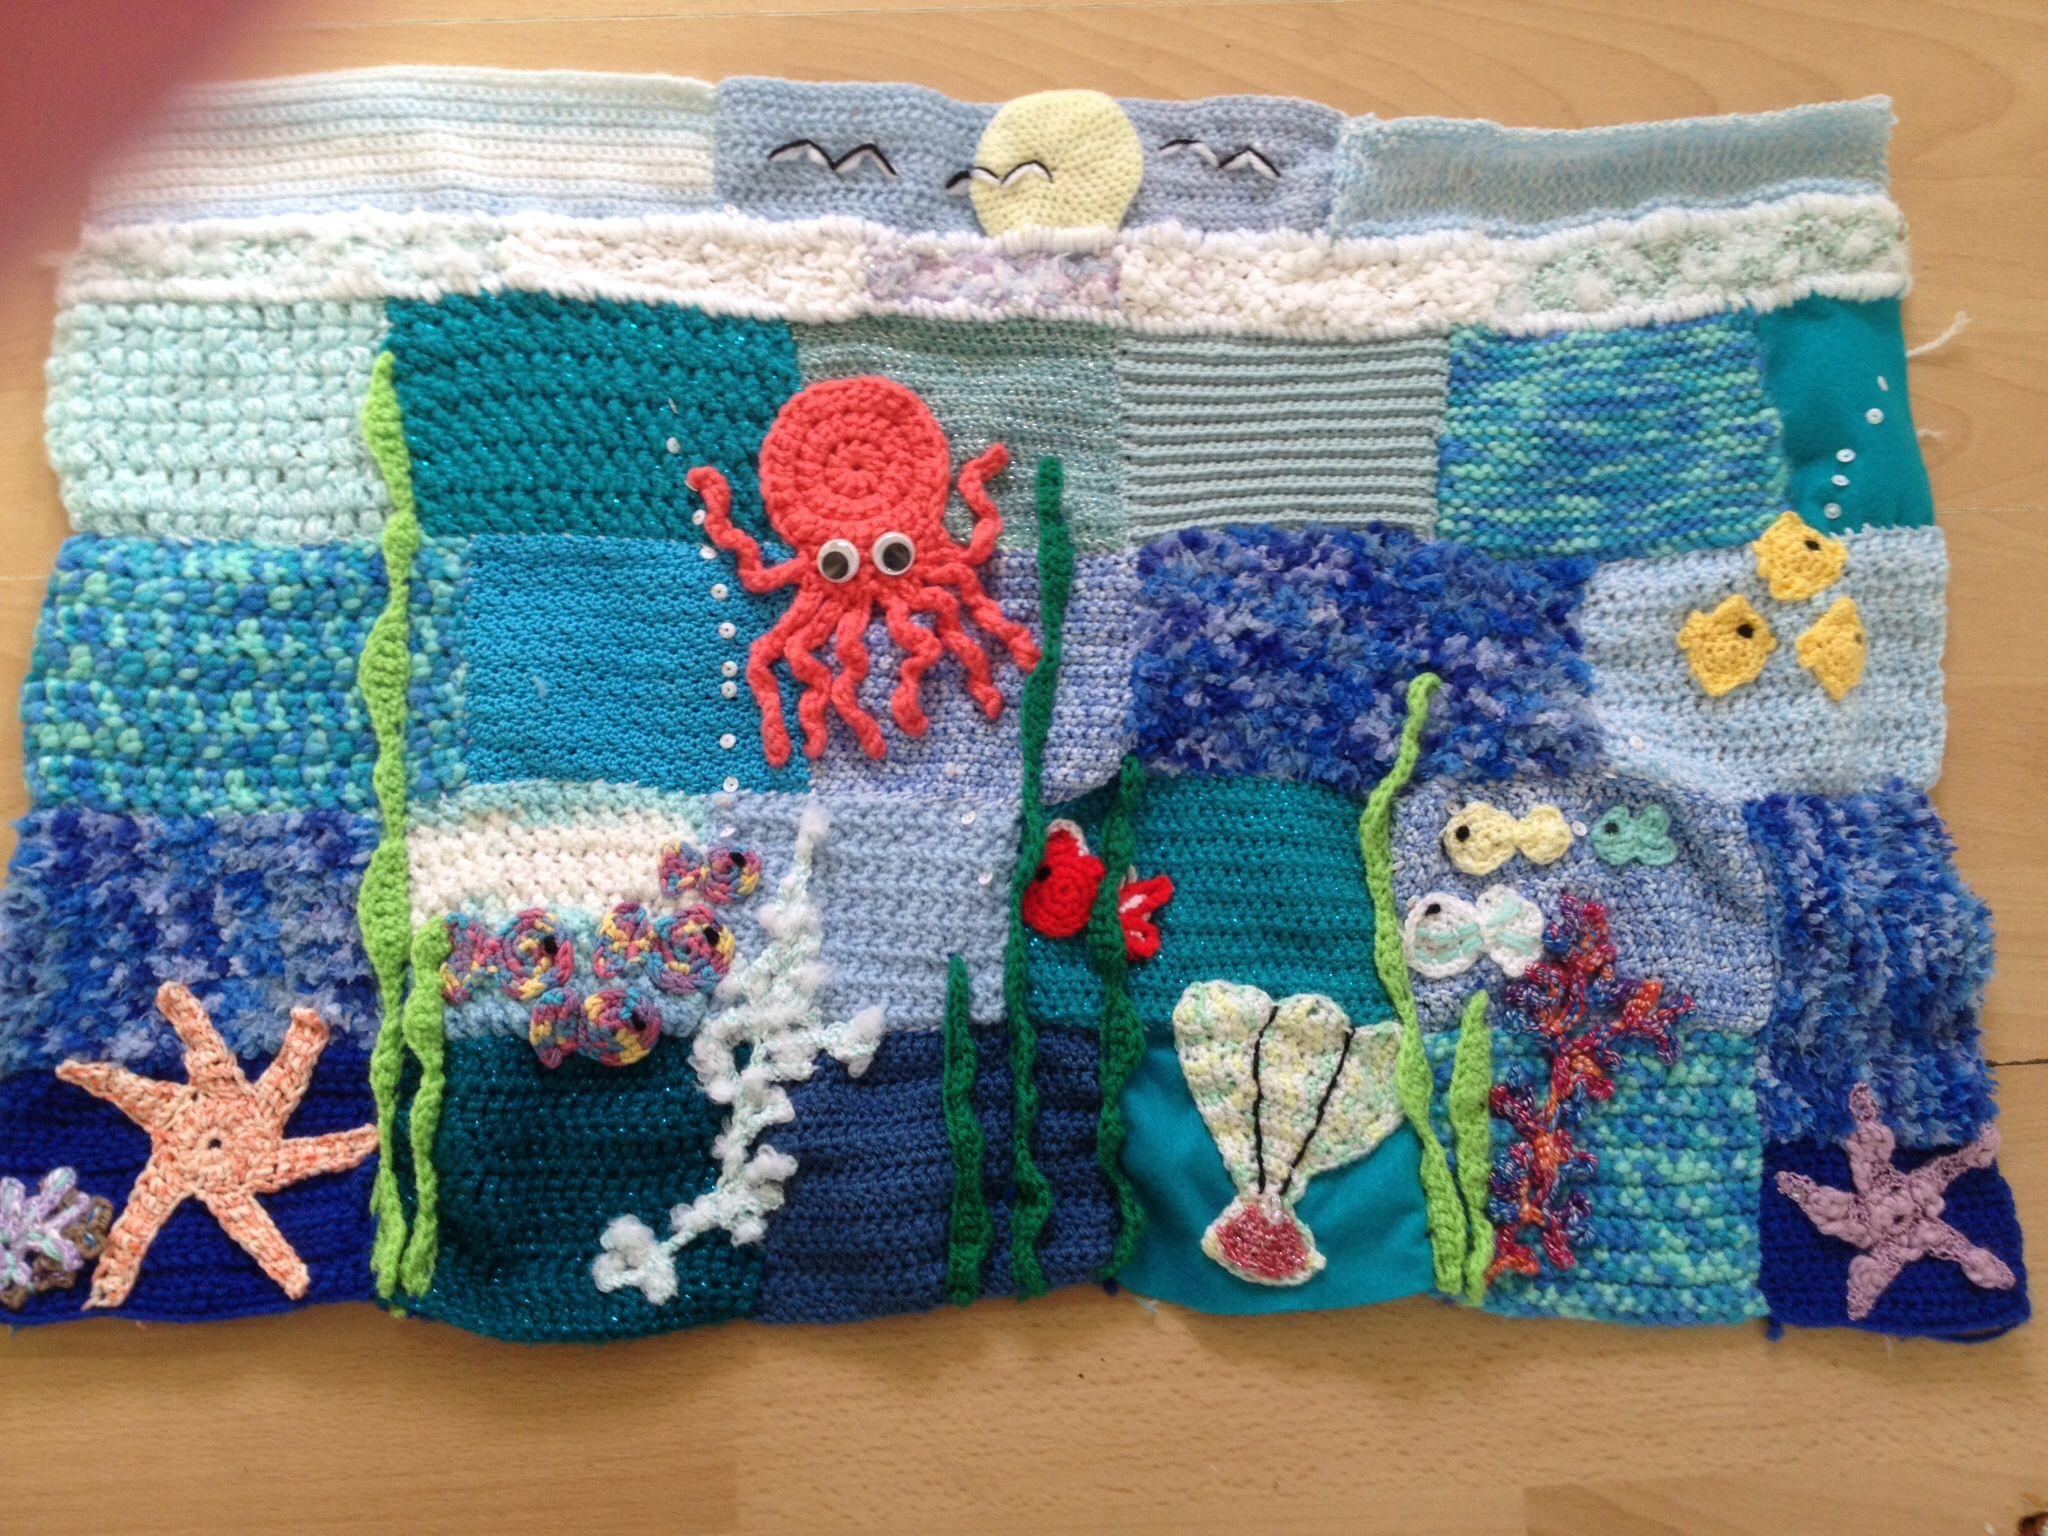 Under The Sea Handmade Crocheted Sensory Weighted